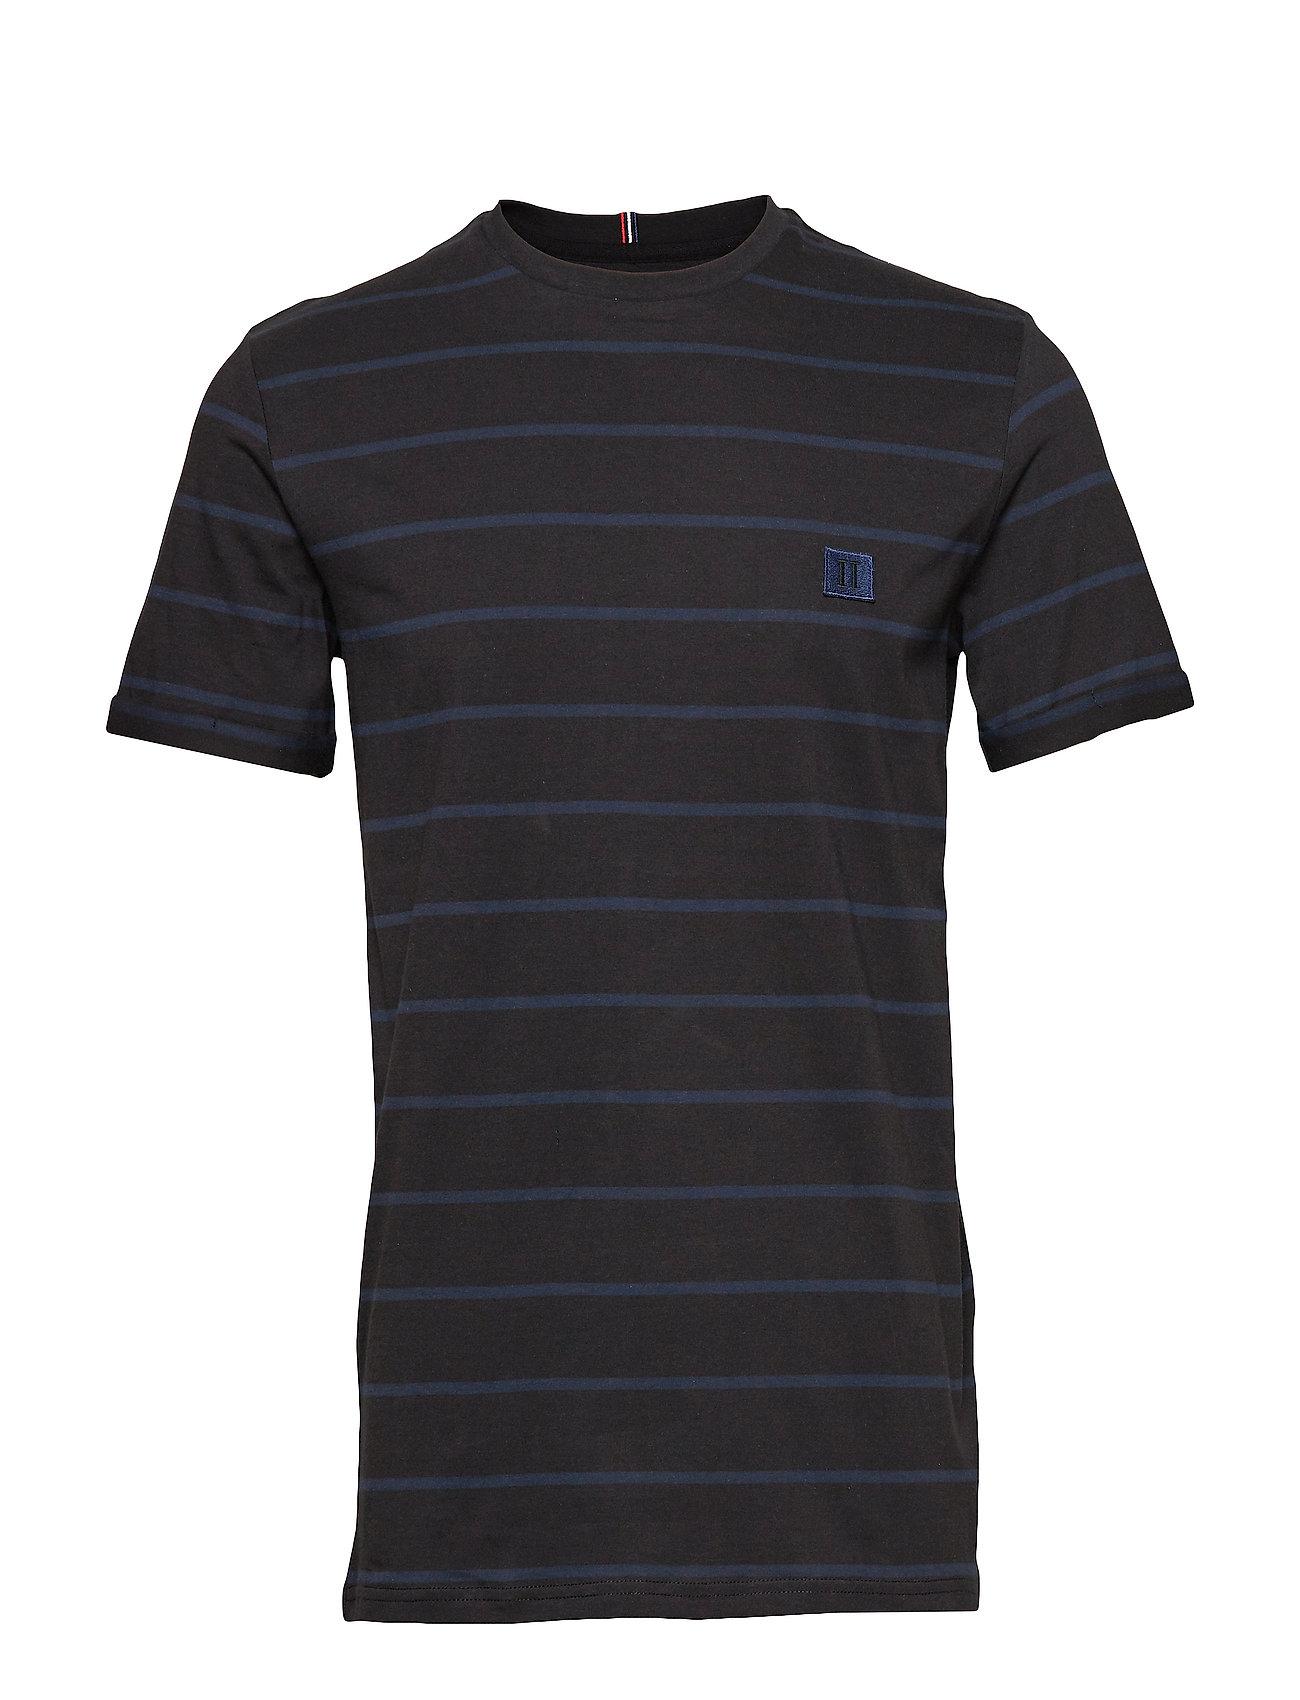 Les Deux Betroist T-Shirt - BLACK/DK. NAVY